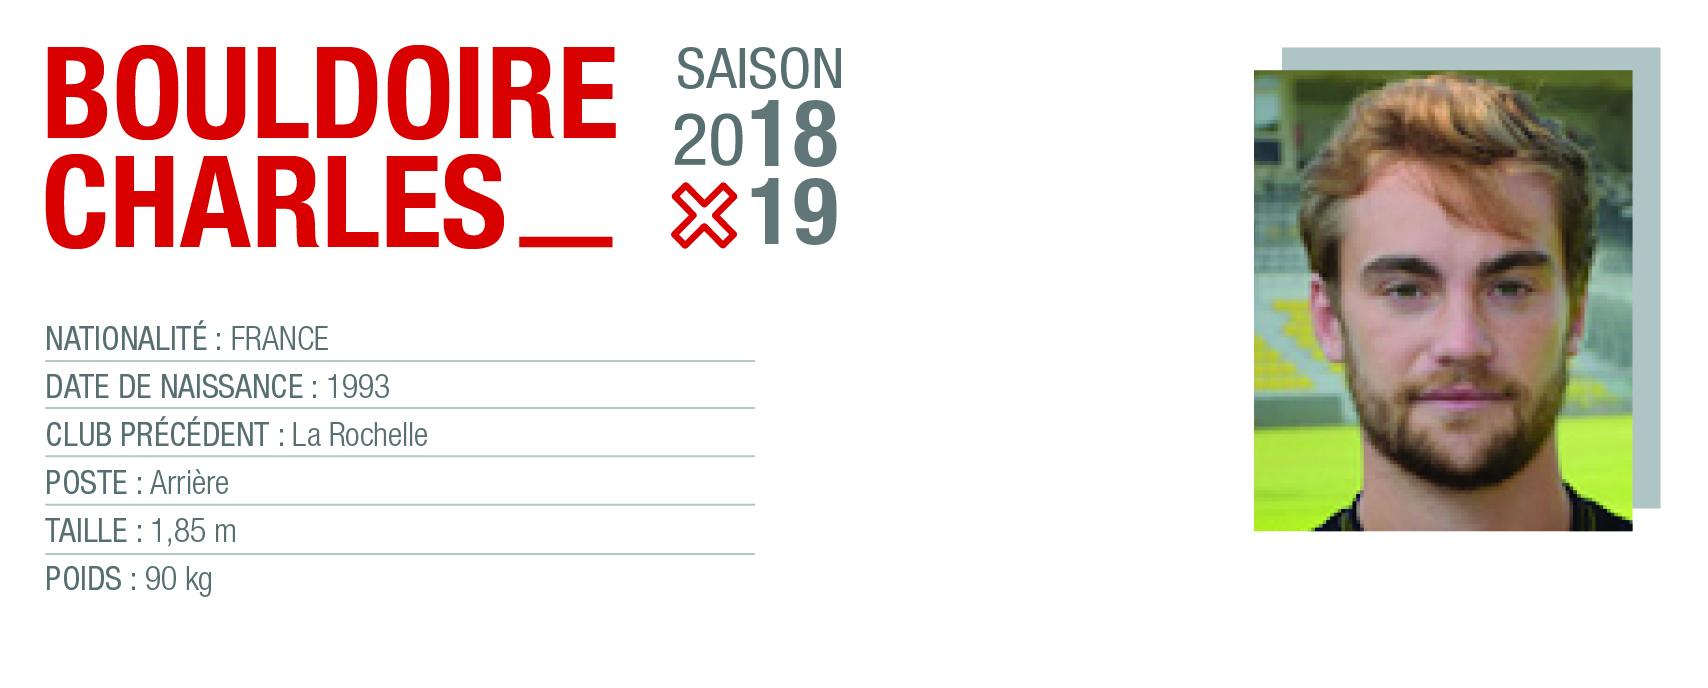 SAISON 2018 - 2019 - Page 2 5b2392c9c8879b7d7b023f3a